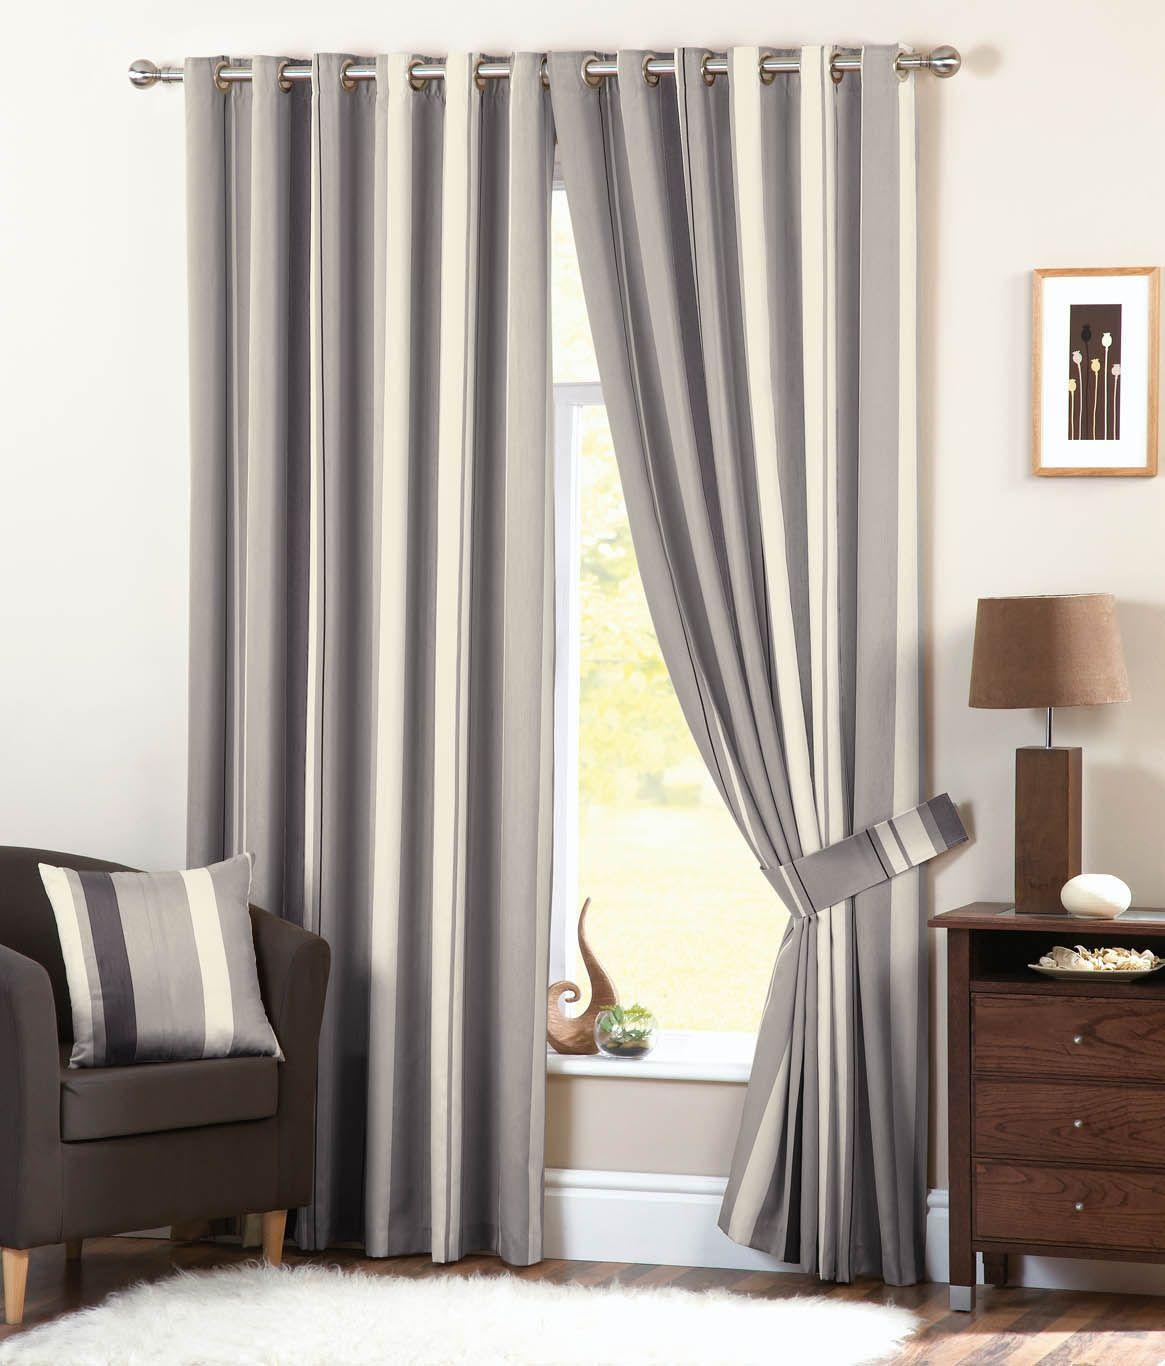 fancy plush design moorish tile curtain. Finlay  Charcoal Ready Made Curtains from 26 86 A modern Grey Smart Stripe